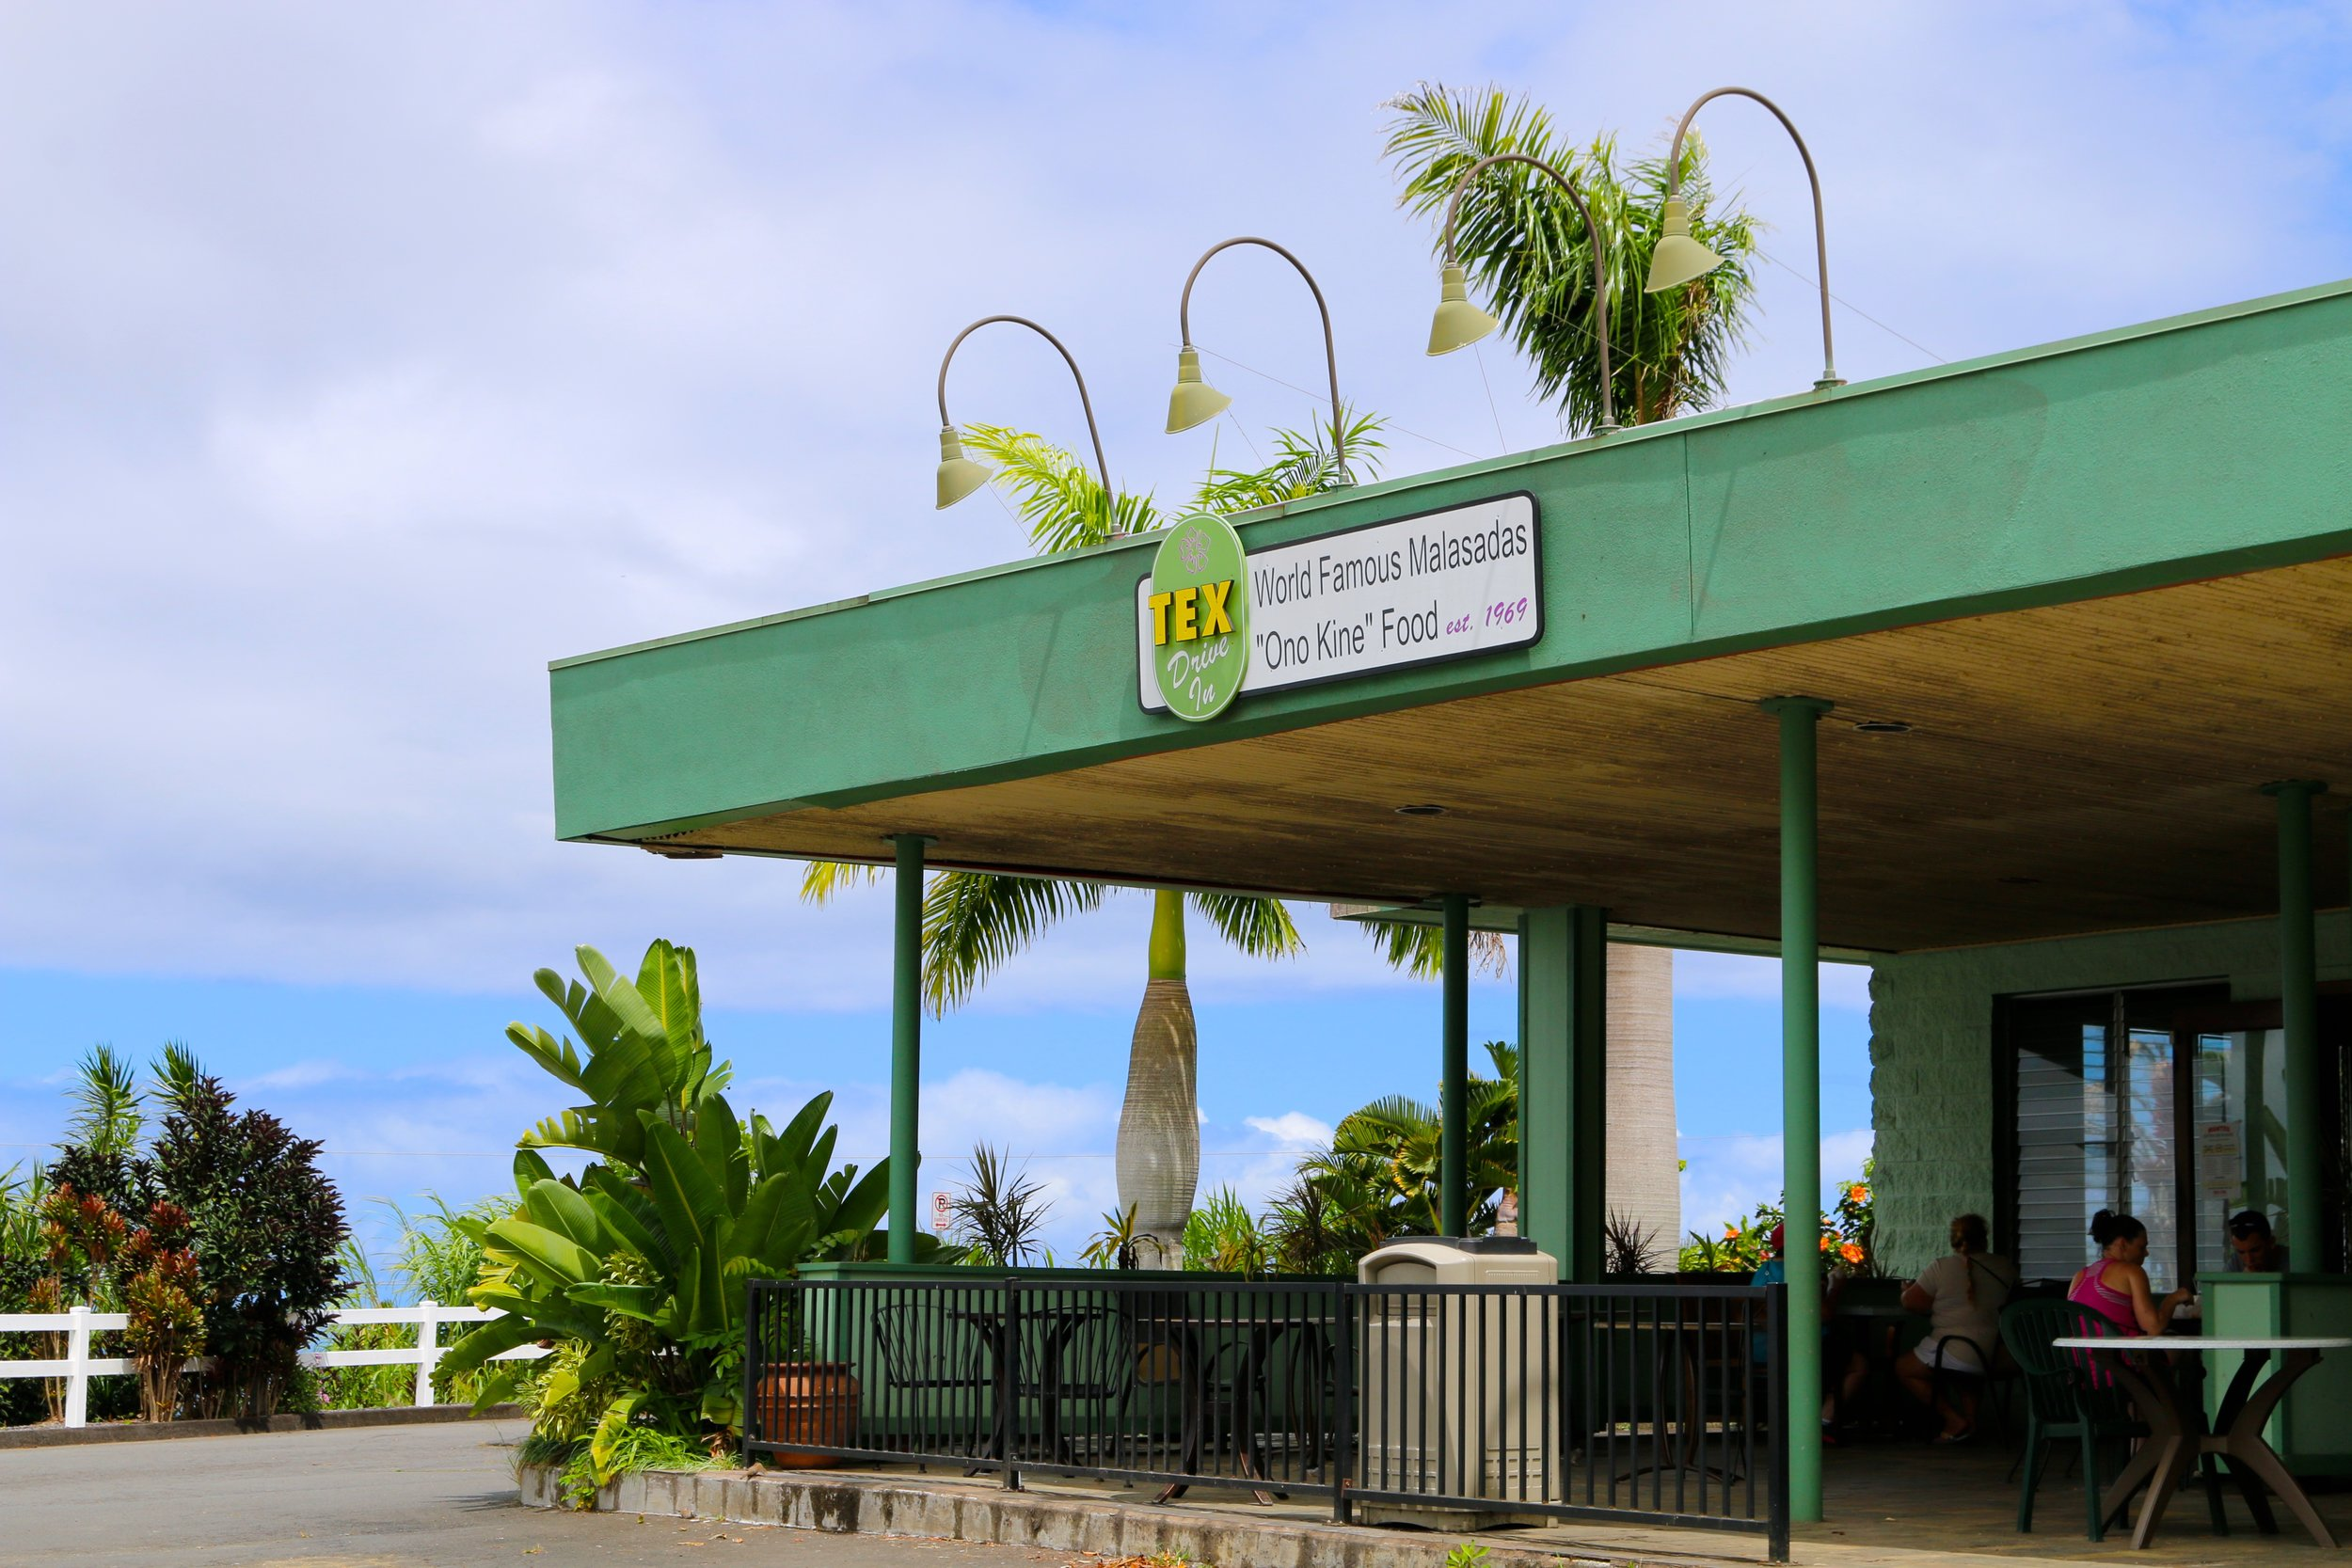 BACK TO SUNSHINE @ TEX DRIVE-IN IN HONOKAA